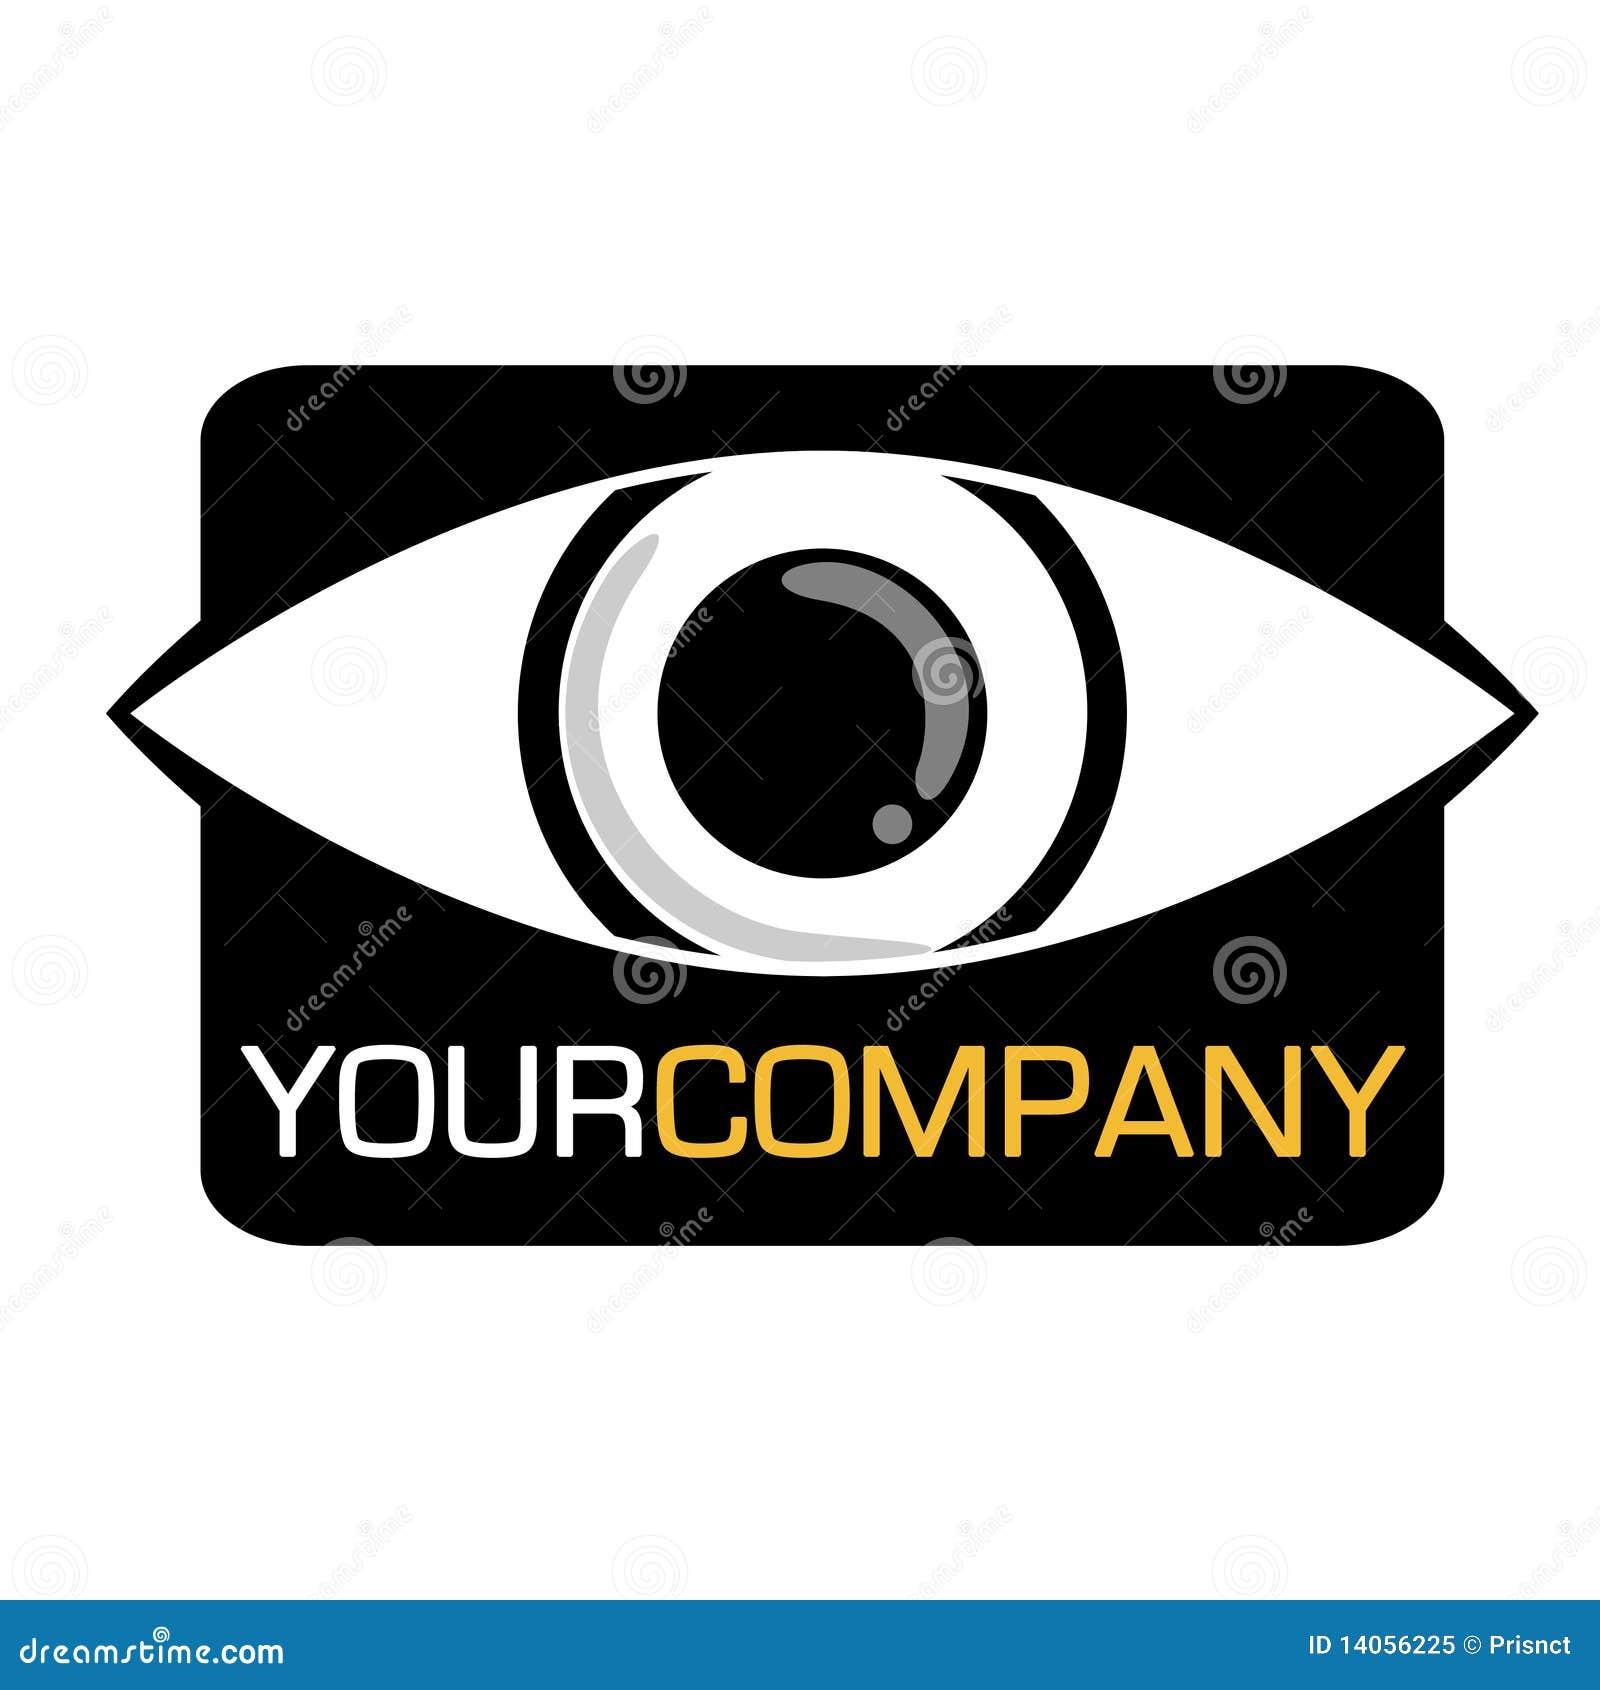 Eye Company Logo stock vector. Illustration of logo ...